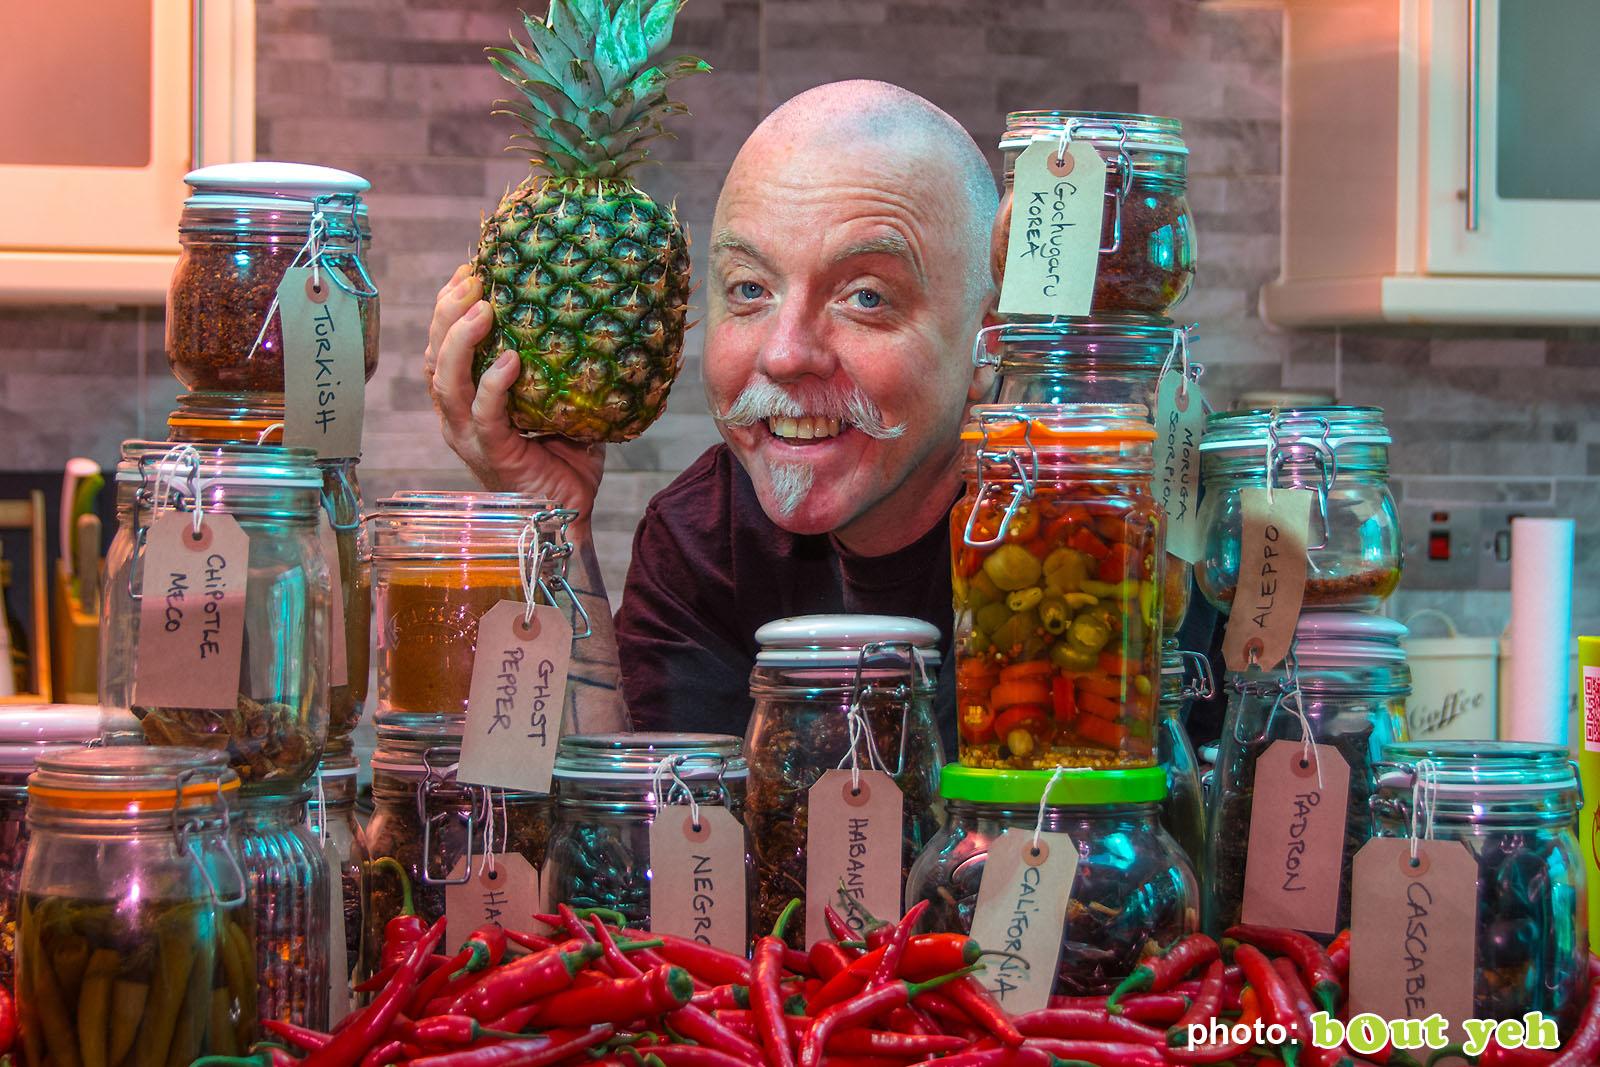 Tim McCarthy, Blackfire Hot sauces photo 6683 - Bout Yeh photographers Belfast